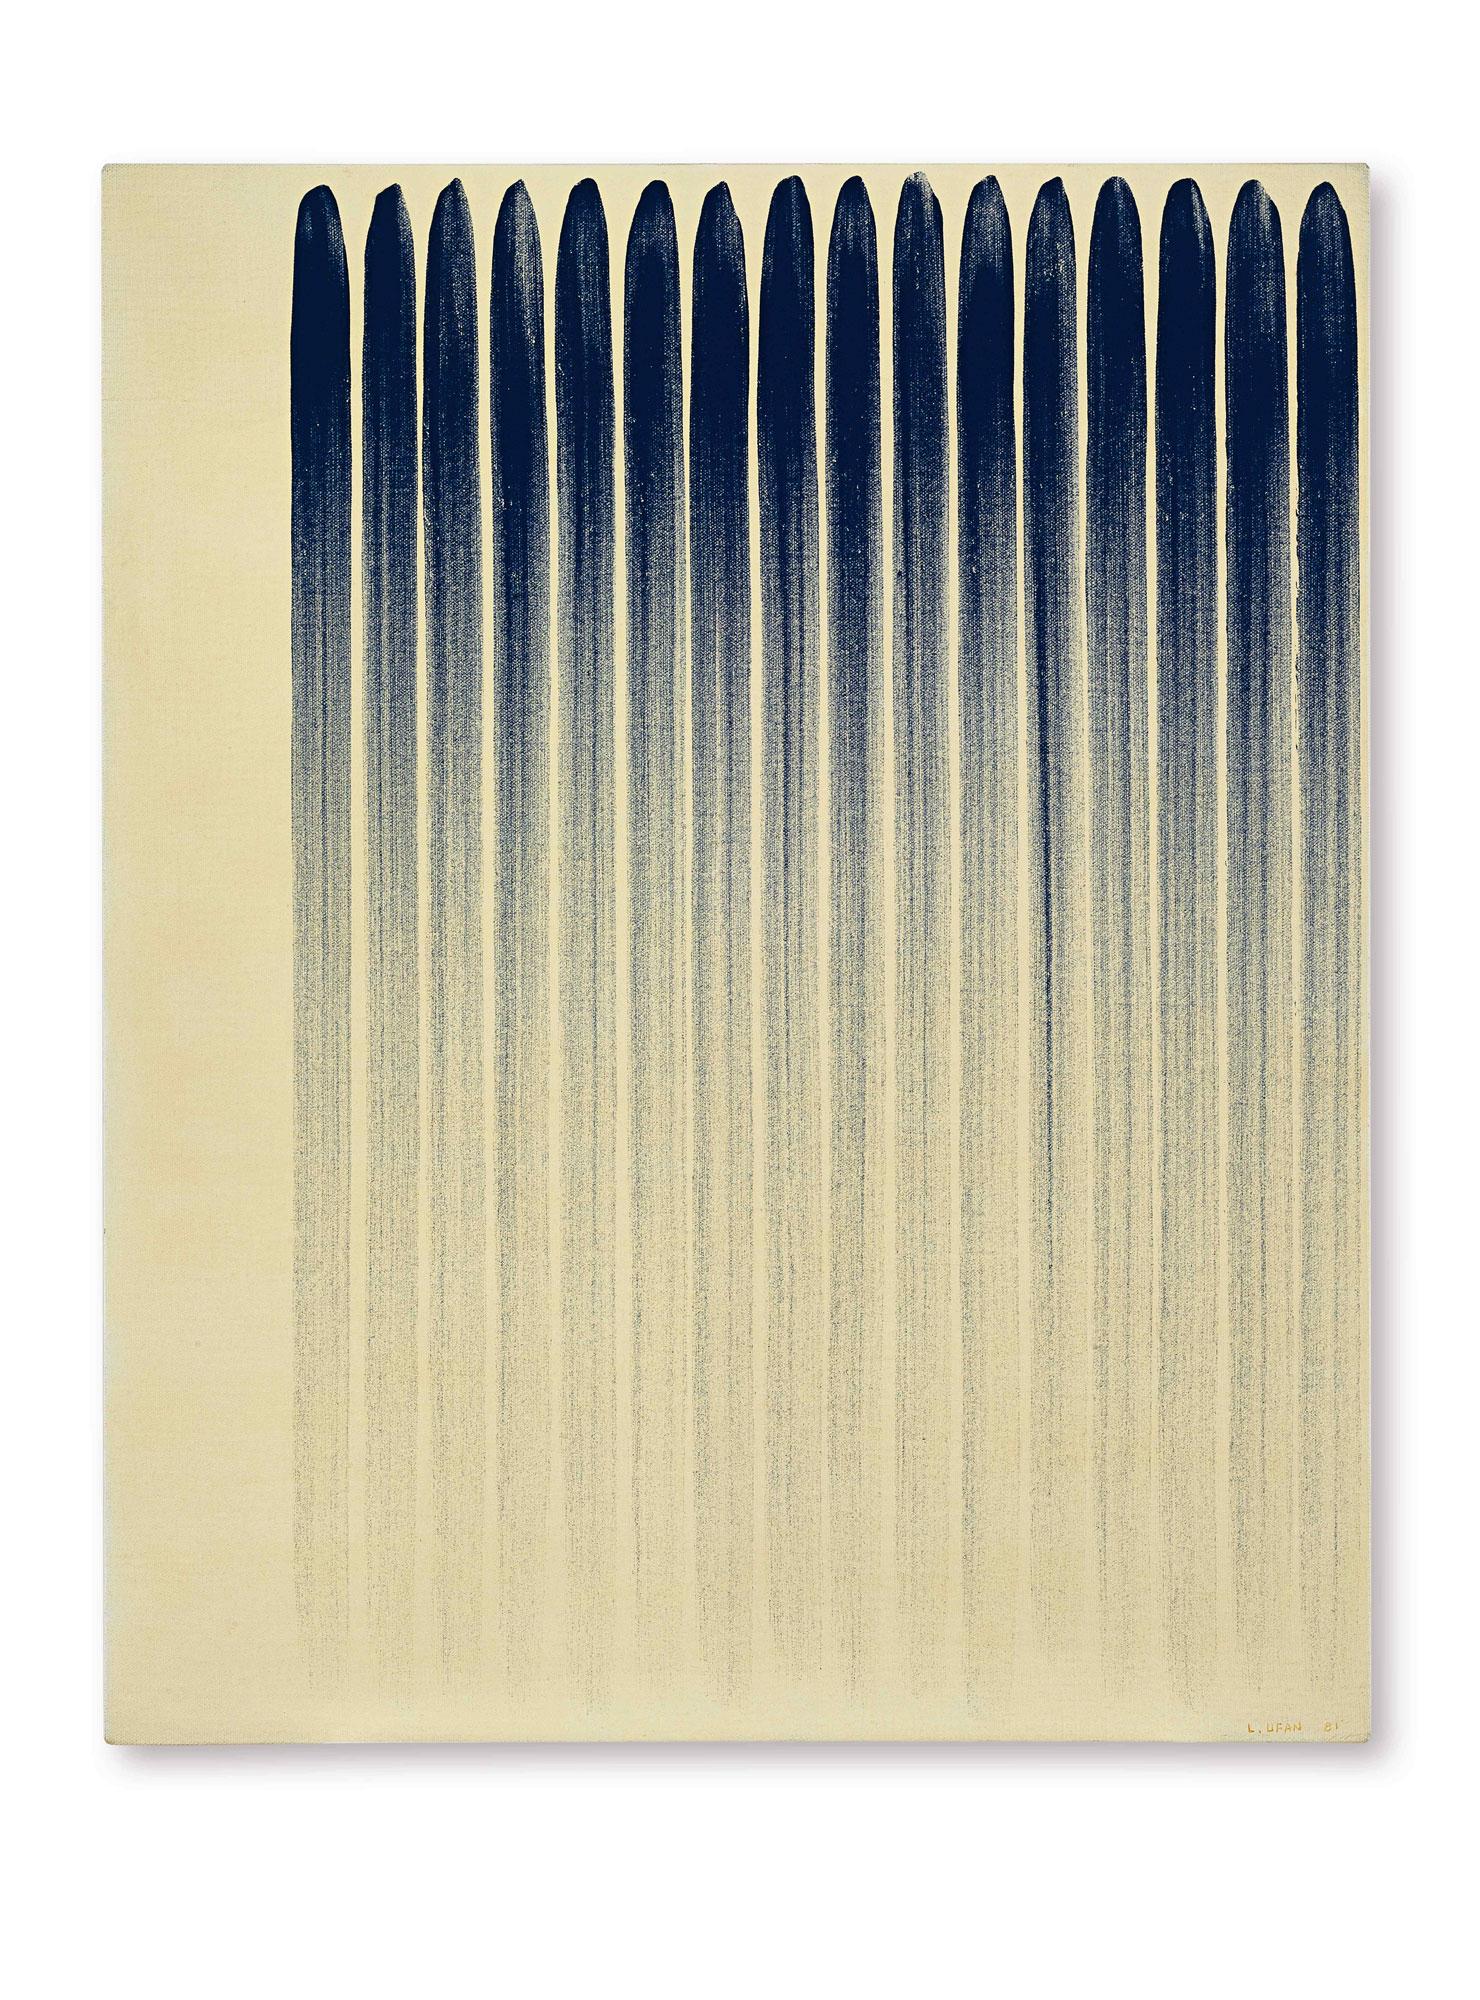 李禹煥 《從線8103》 1981年作,油畫及礦物顏料畫布 100 x 80.5 公分ee-Ufan_From-Line-8103-s.jpg